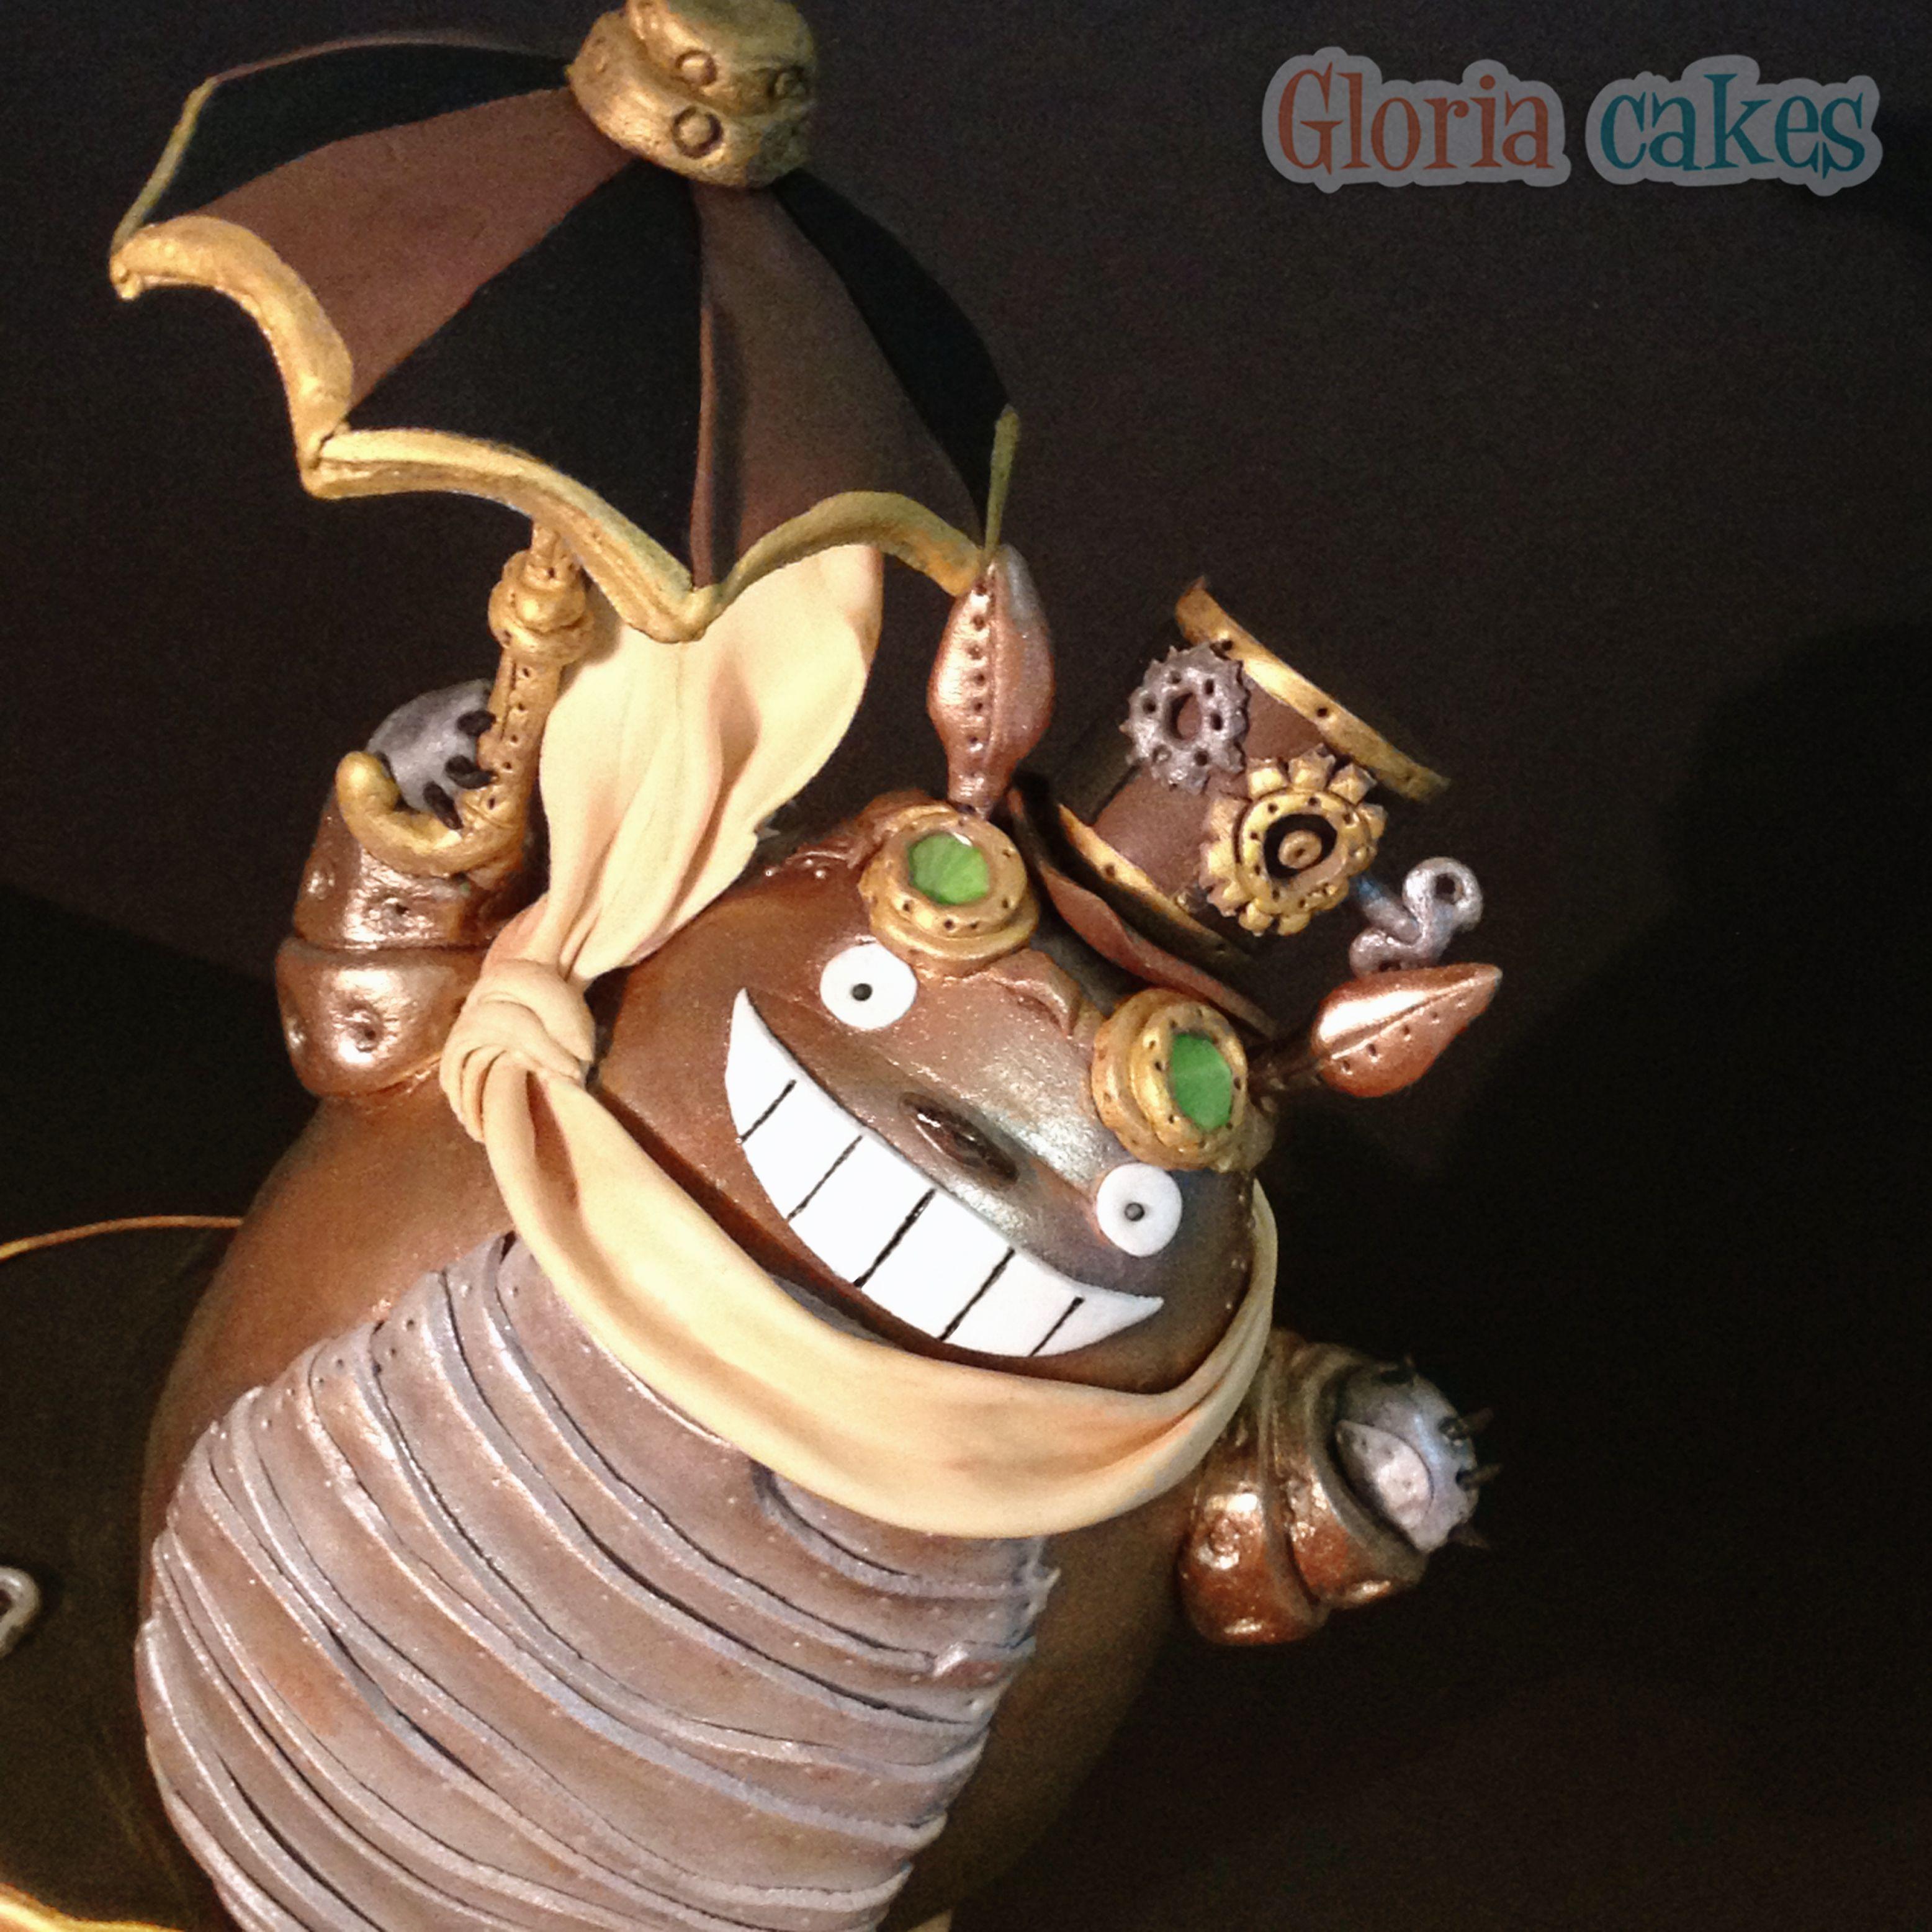 Steampunk Totoro Cake www.facebook.com/GloriaCakes www.GloriaCakes.com